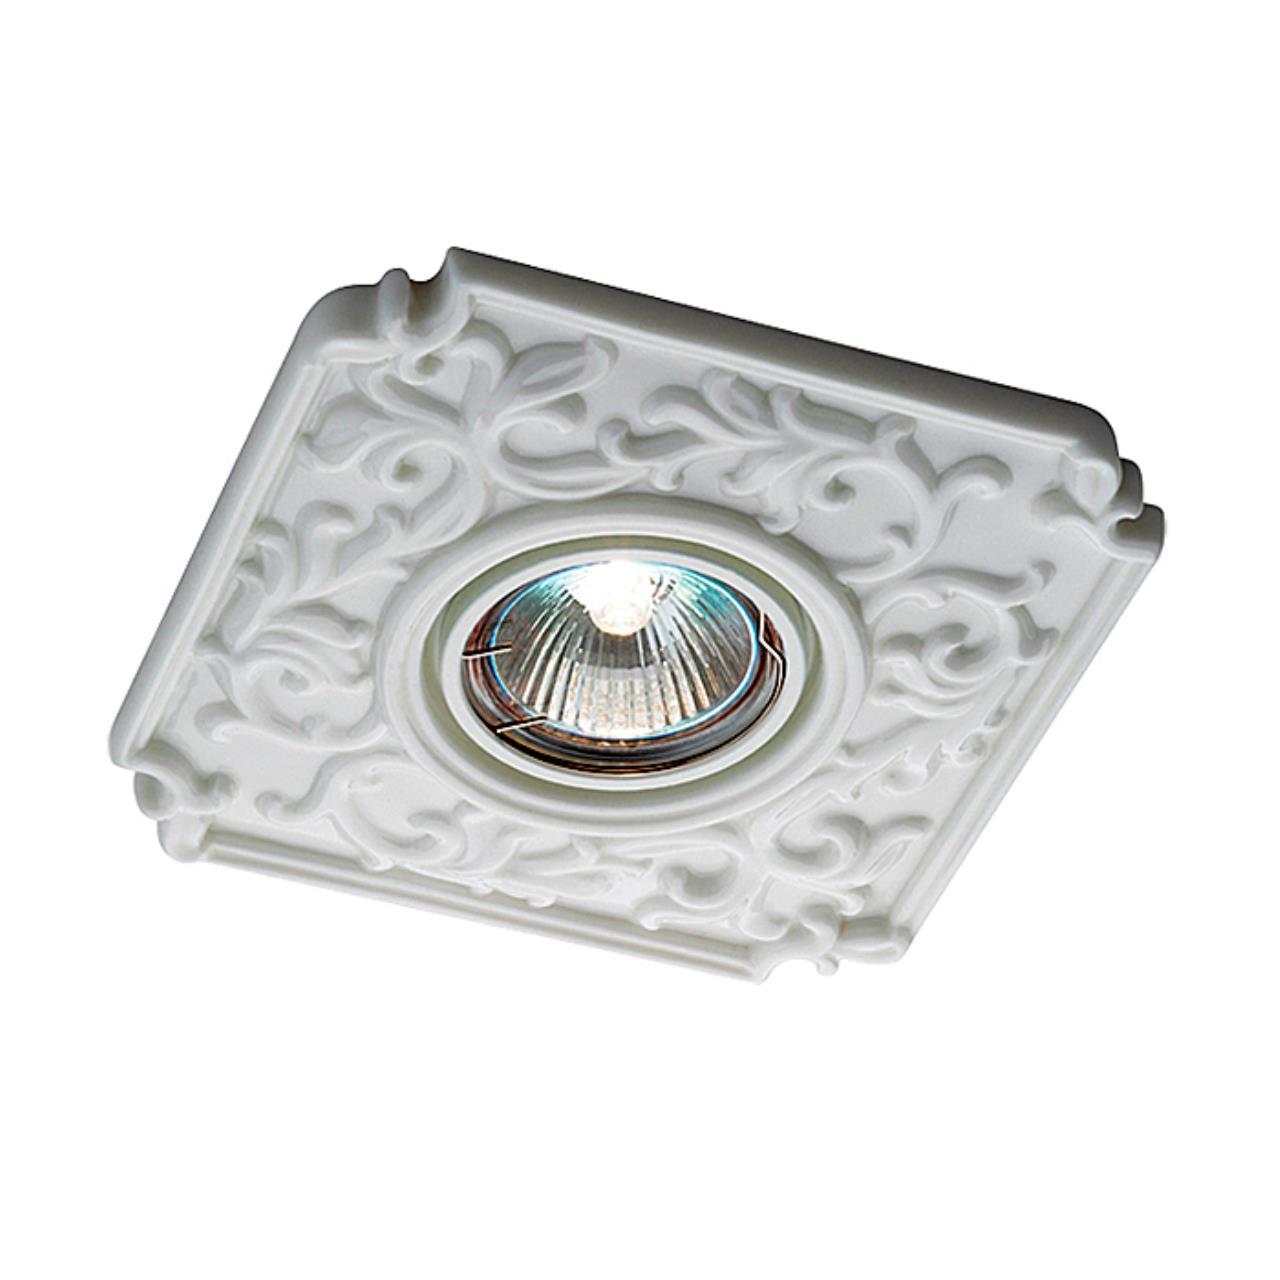 369865 SPOT NT14 120 белый Встраиваемый светильник IP20 GX5.3 50W 12V FARFOR